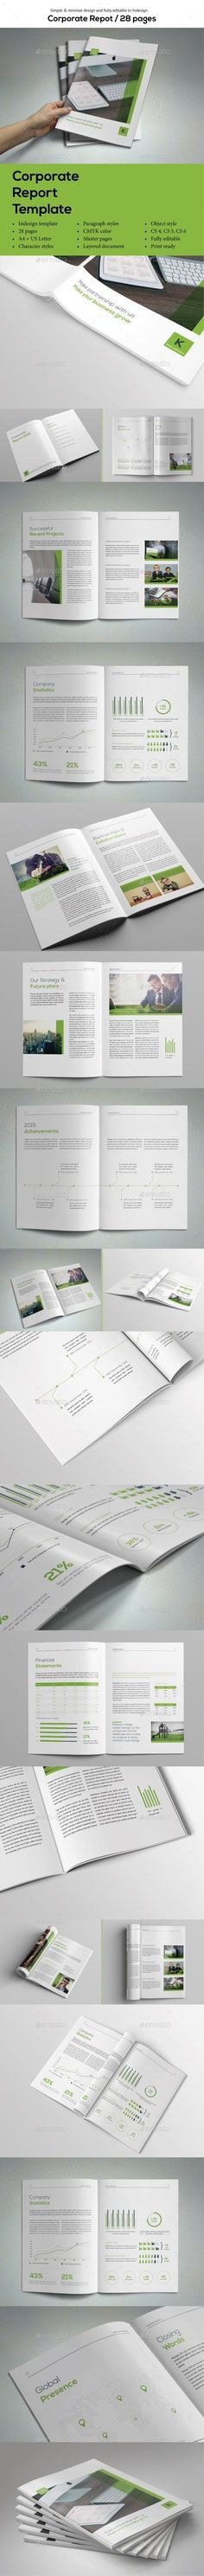 Bimbo Annual Report LAYOUT Brochure Pinterest Annual reports